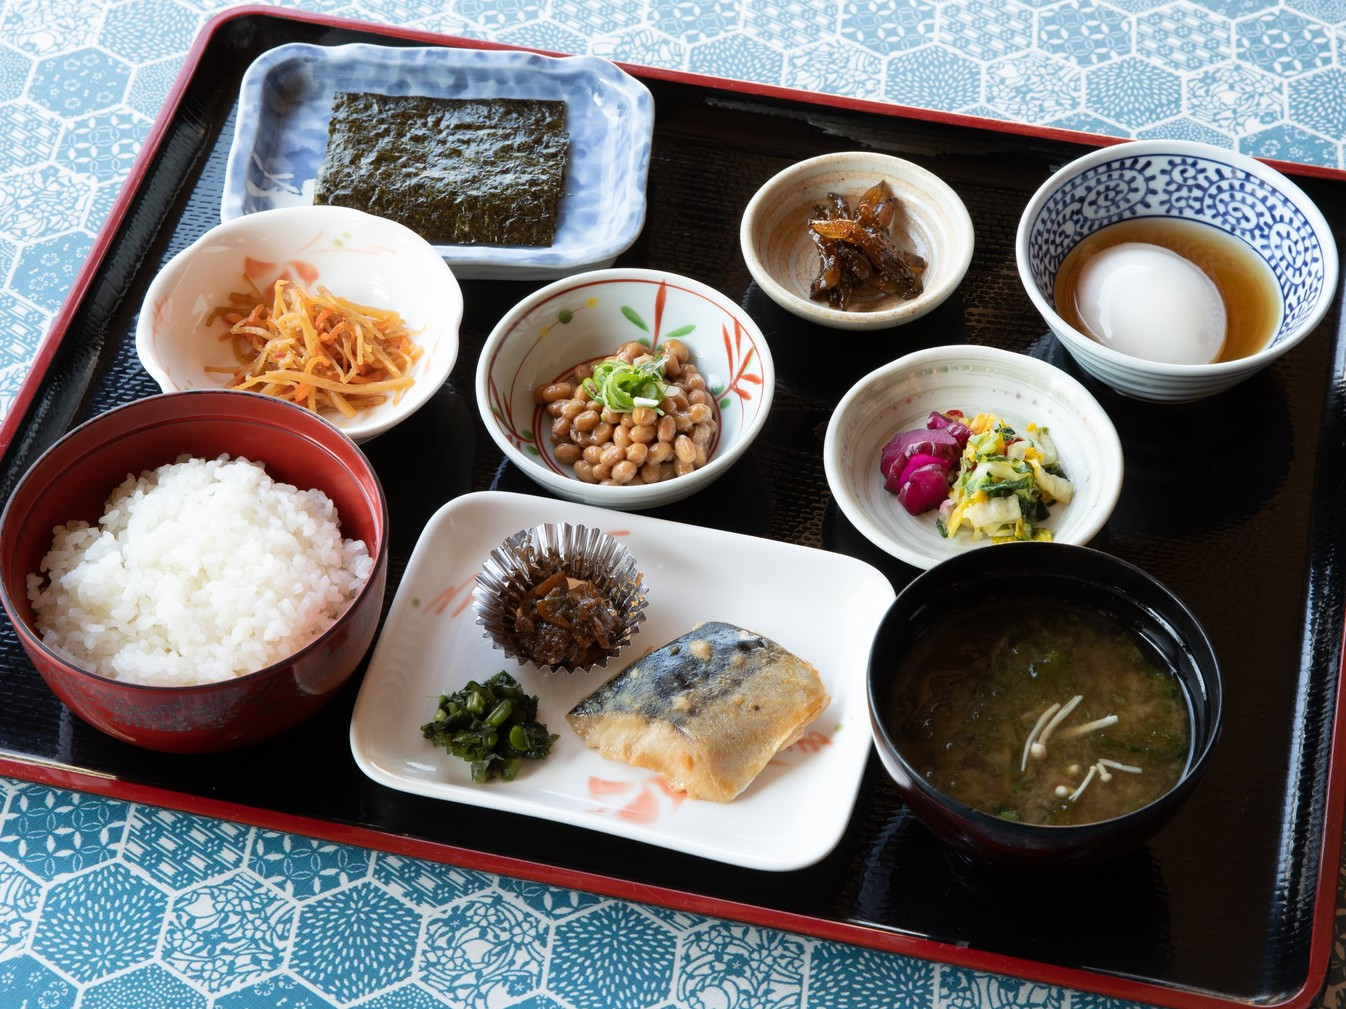 「MIKIMOTO」アメニティーセット付【レディースプラン】朝食付き